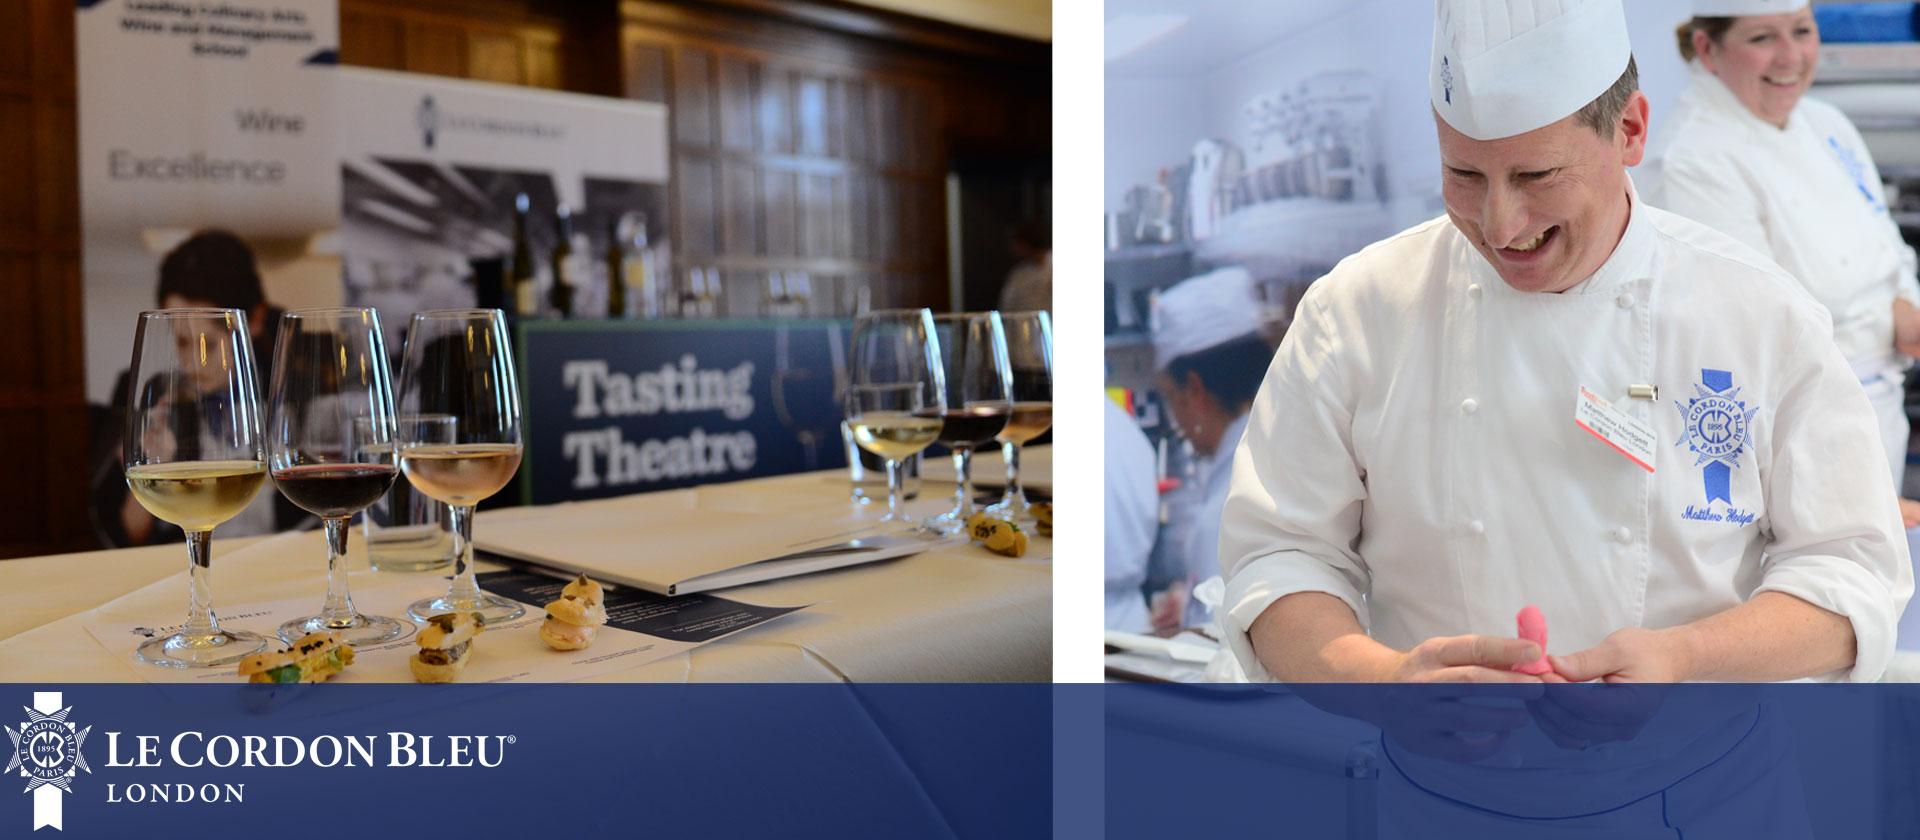 Le Cordon Bleu London visits BBC Good Food Show 2016